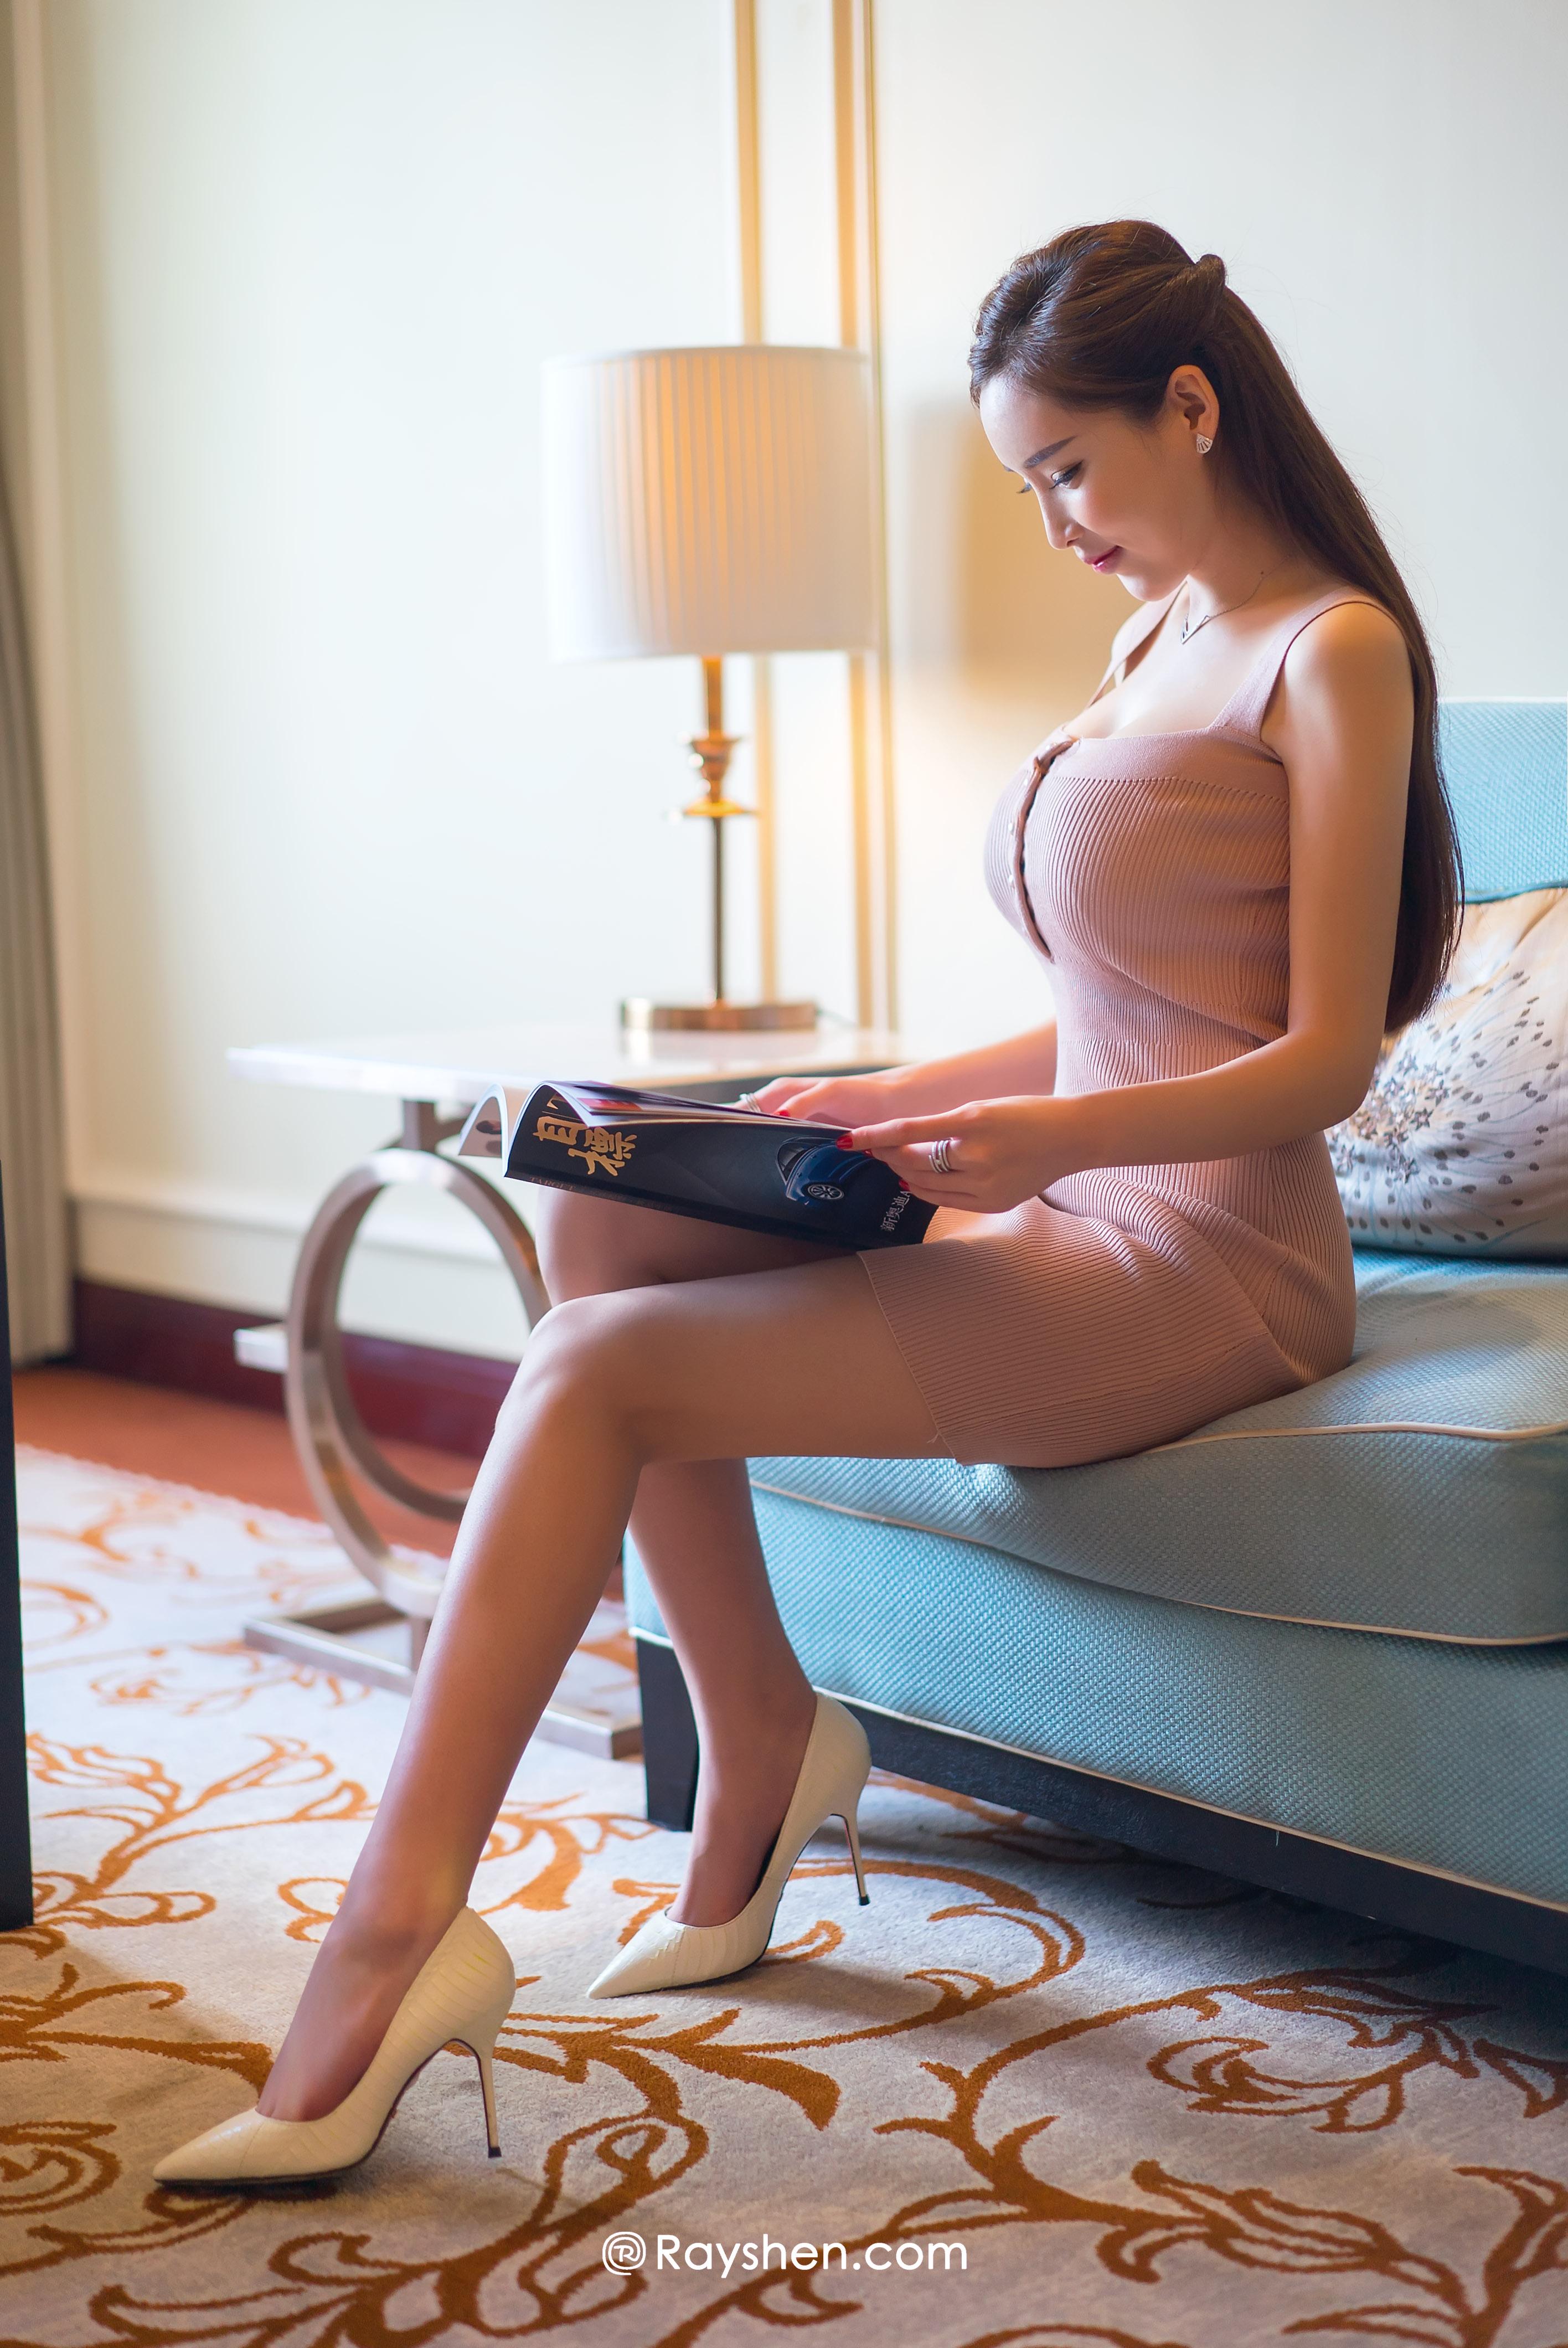 Asiático Morena Modelo De Fondos Largo Pelo Mujer Pantalla ZgwInq0B